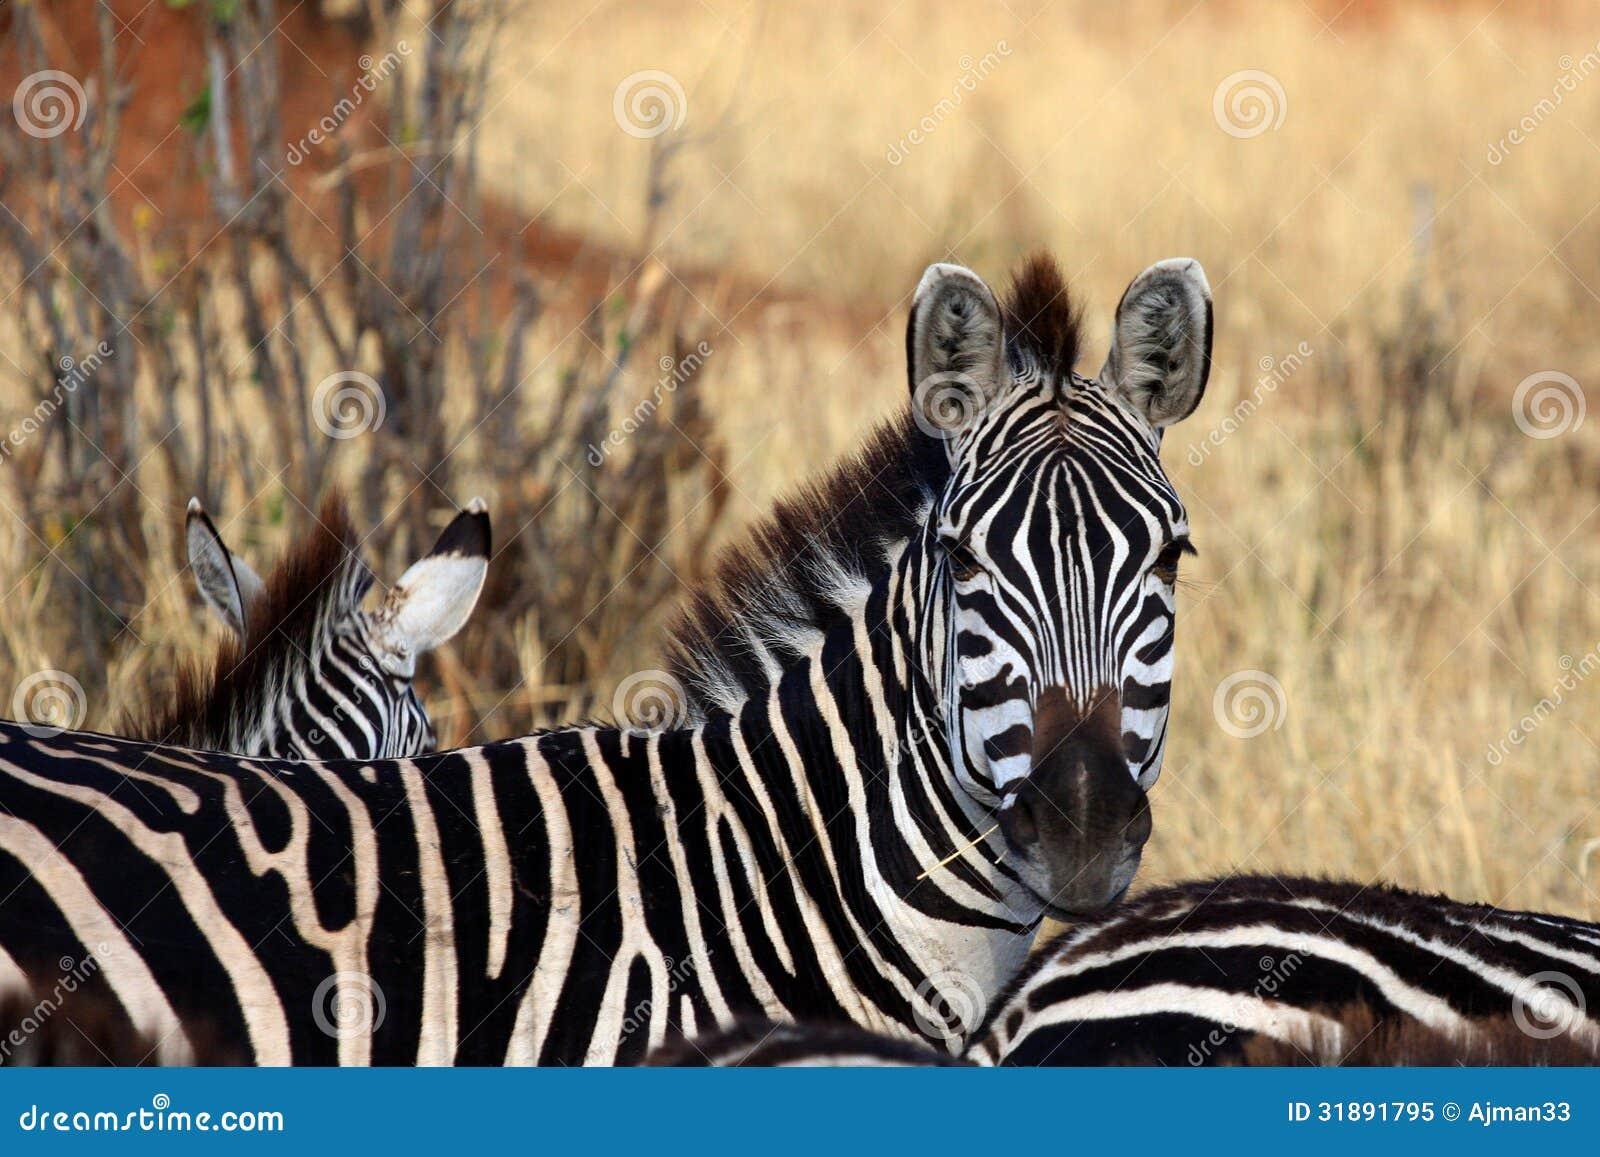 zebra look royalty free stock photo image 31891795. Black Bedroom Furniture Sets. Home Design Ideas